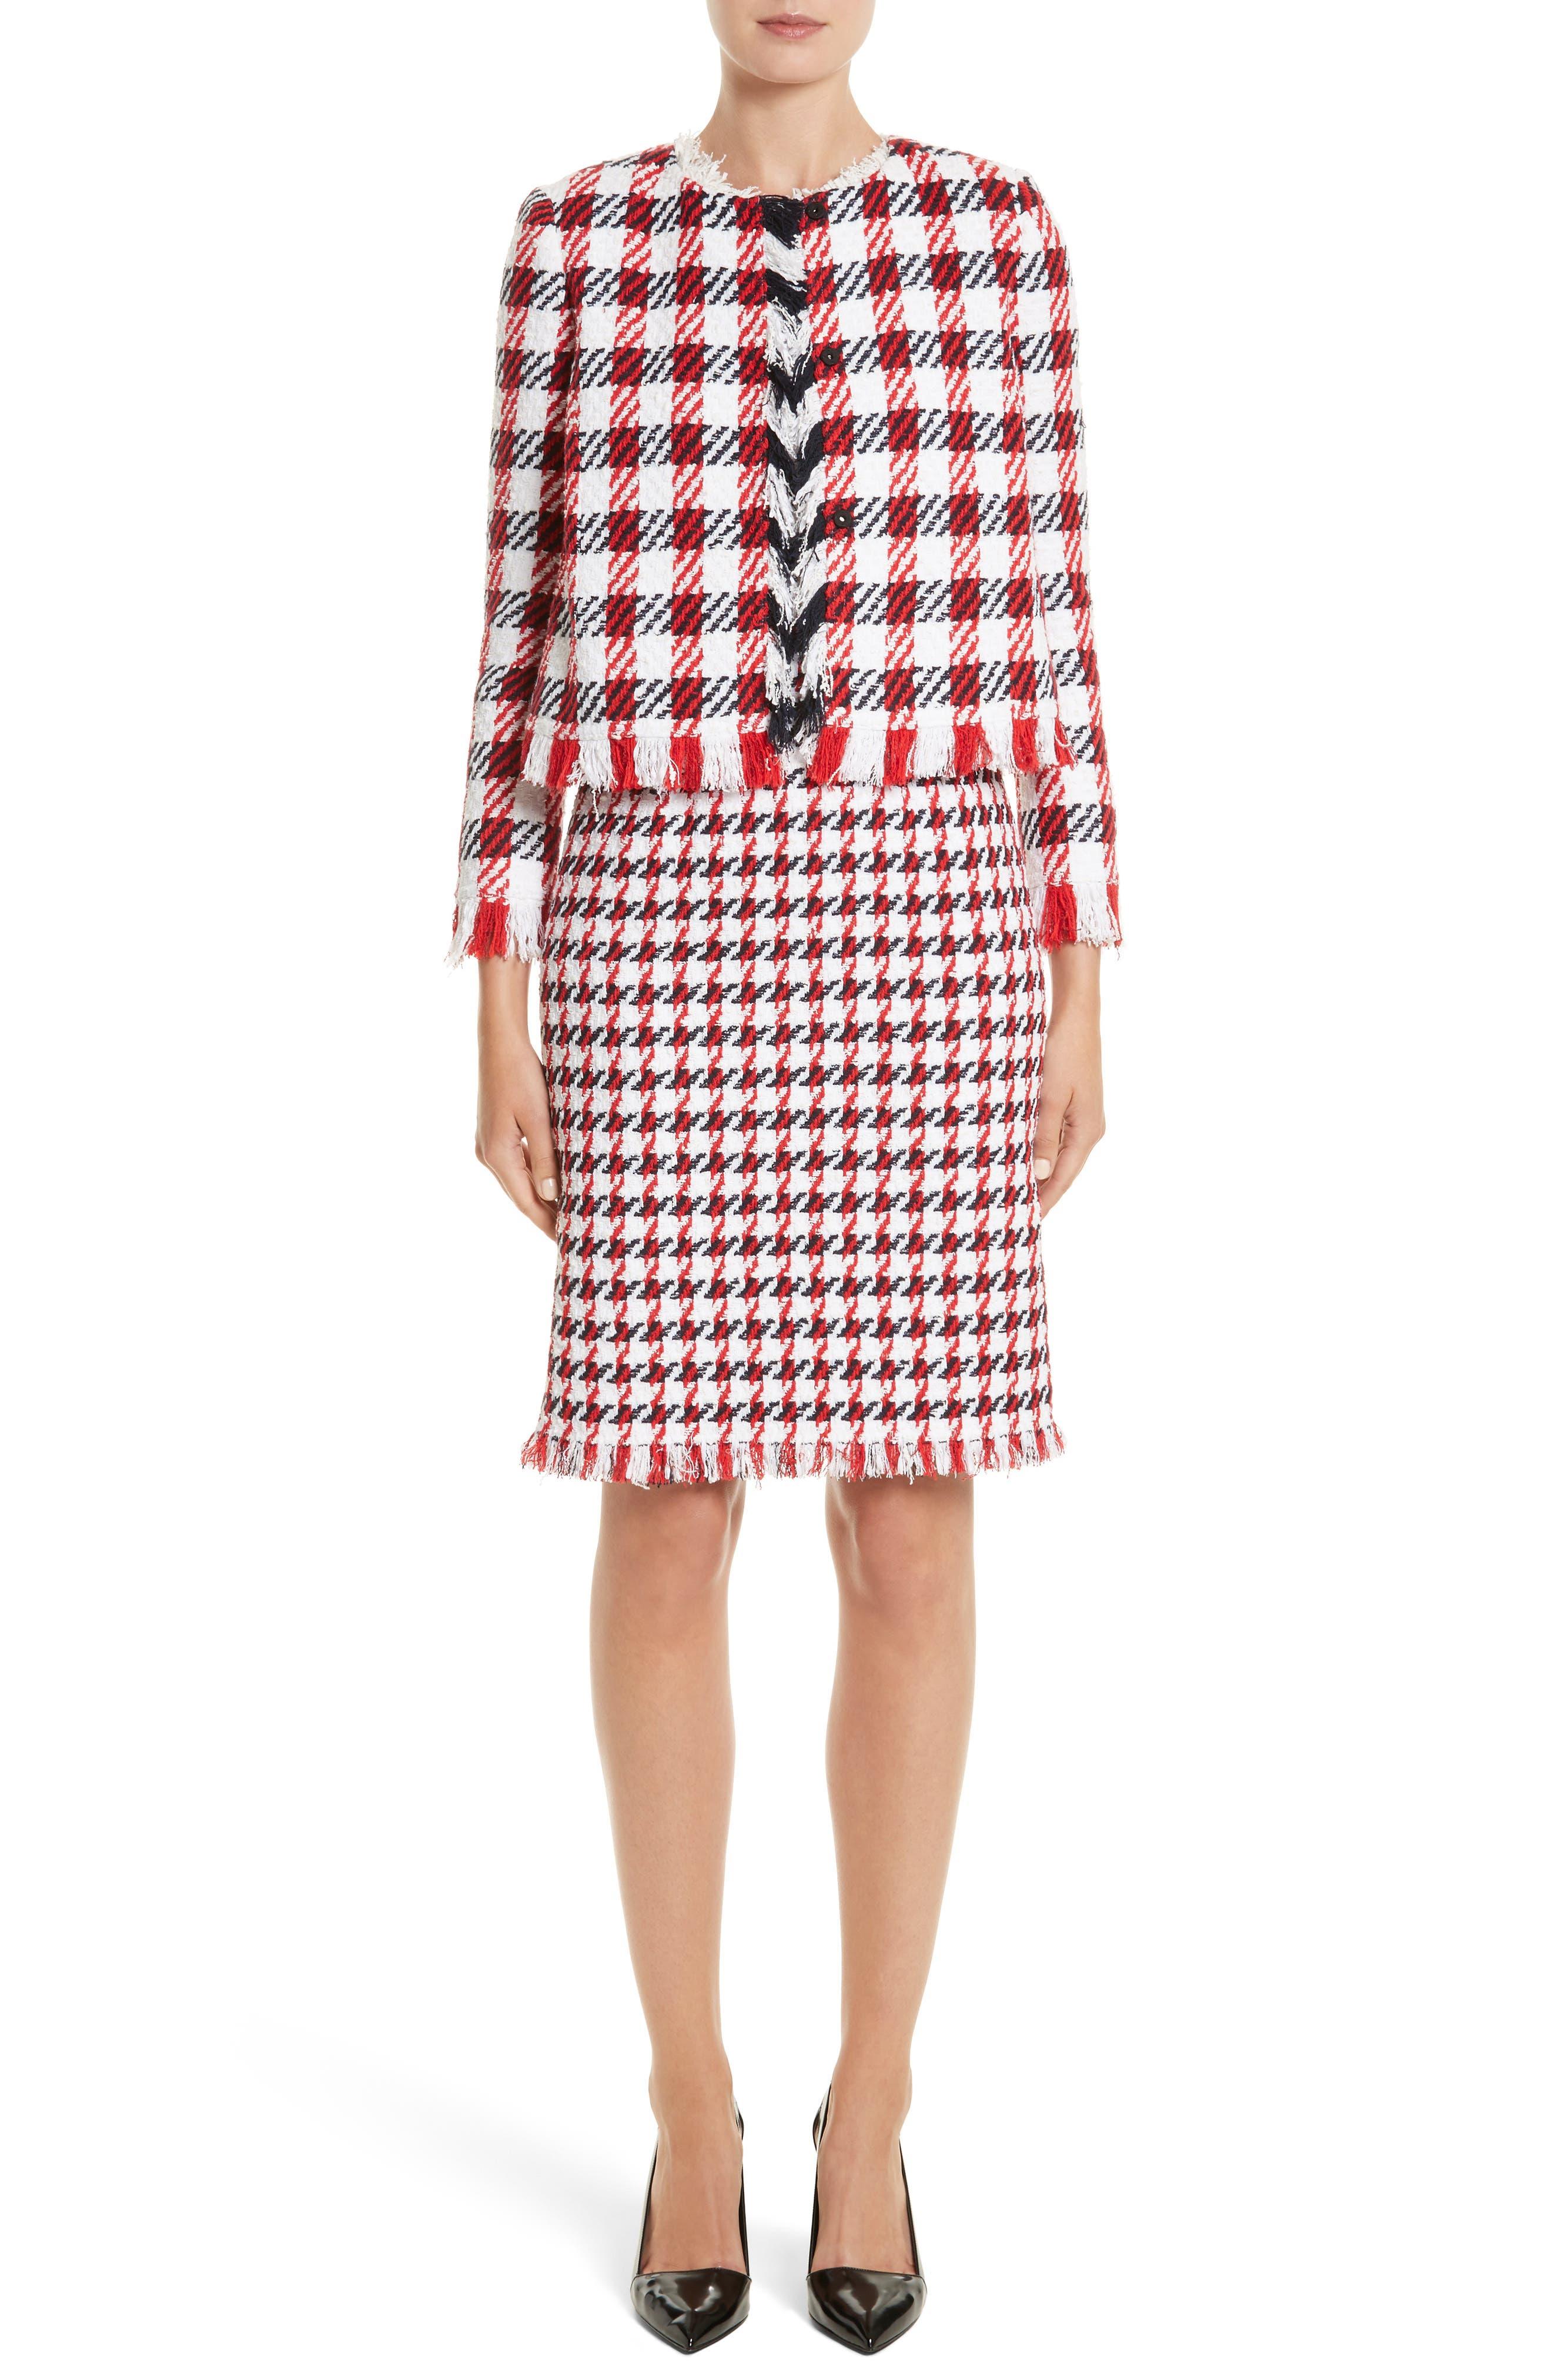 Bicolor Houndstooth Tweed Dress,                             Alternate thumbnail 7, color,                             900